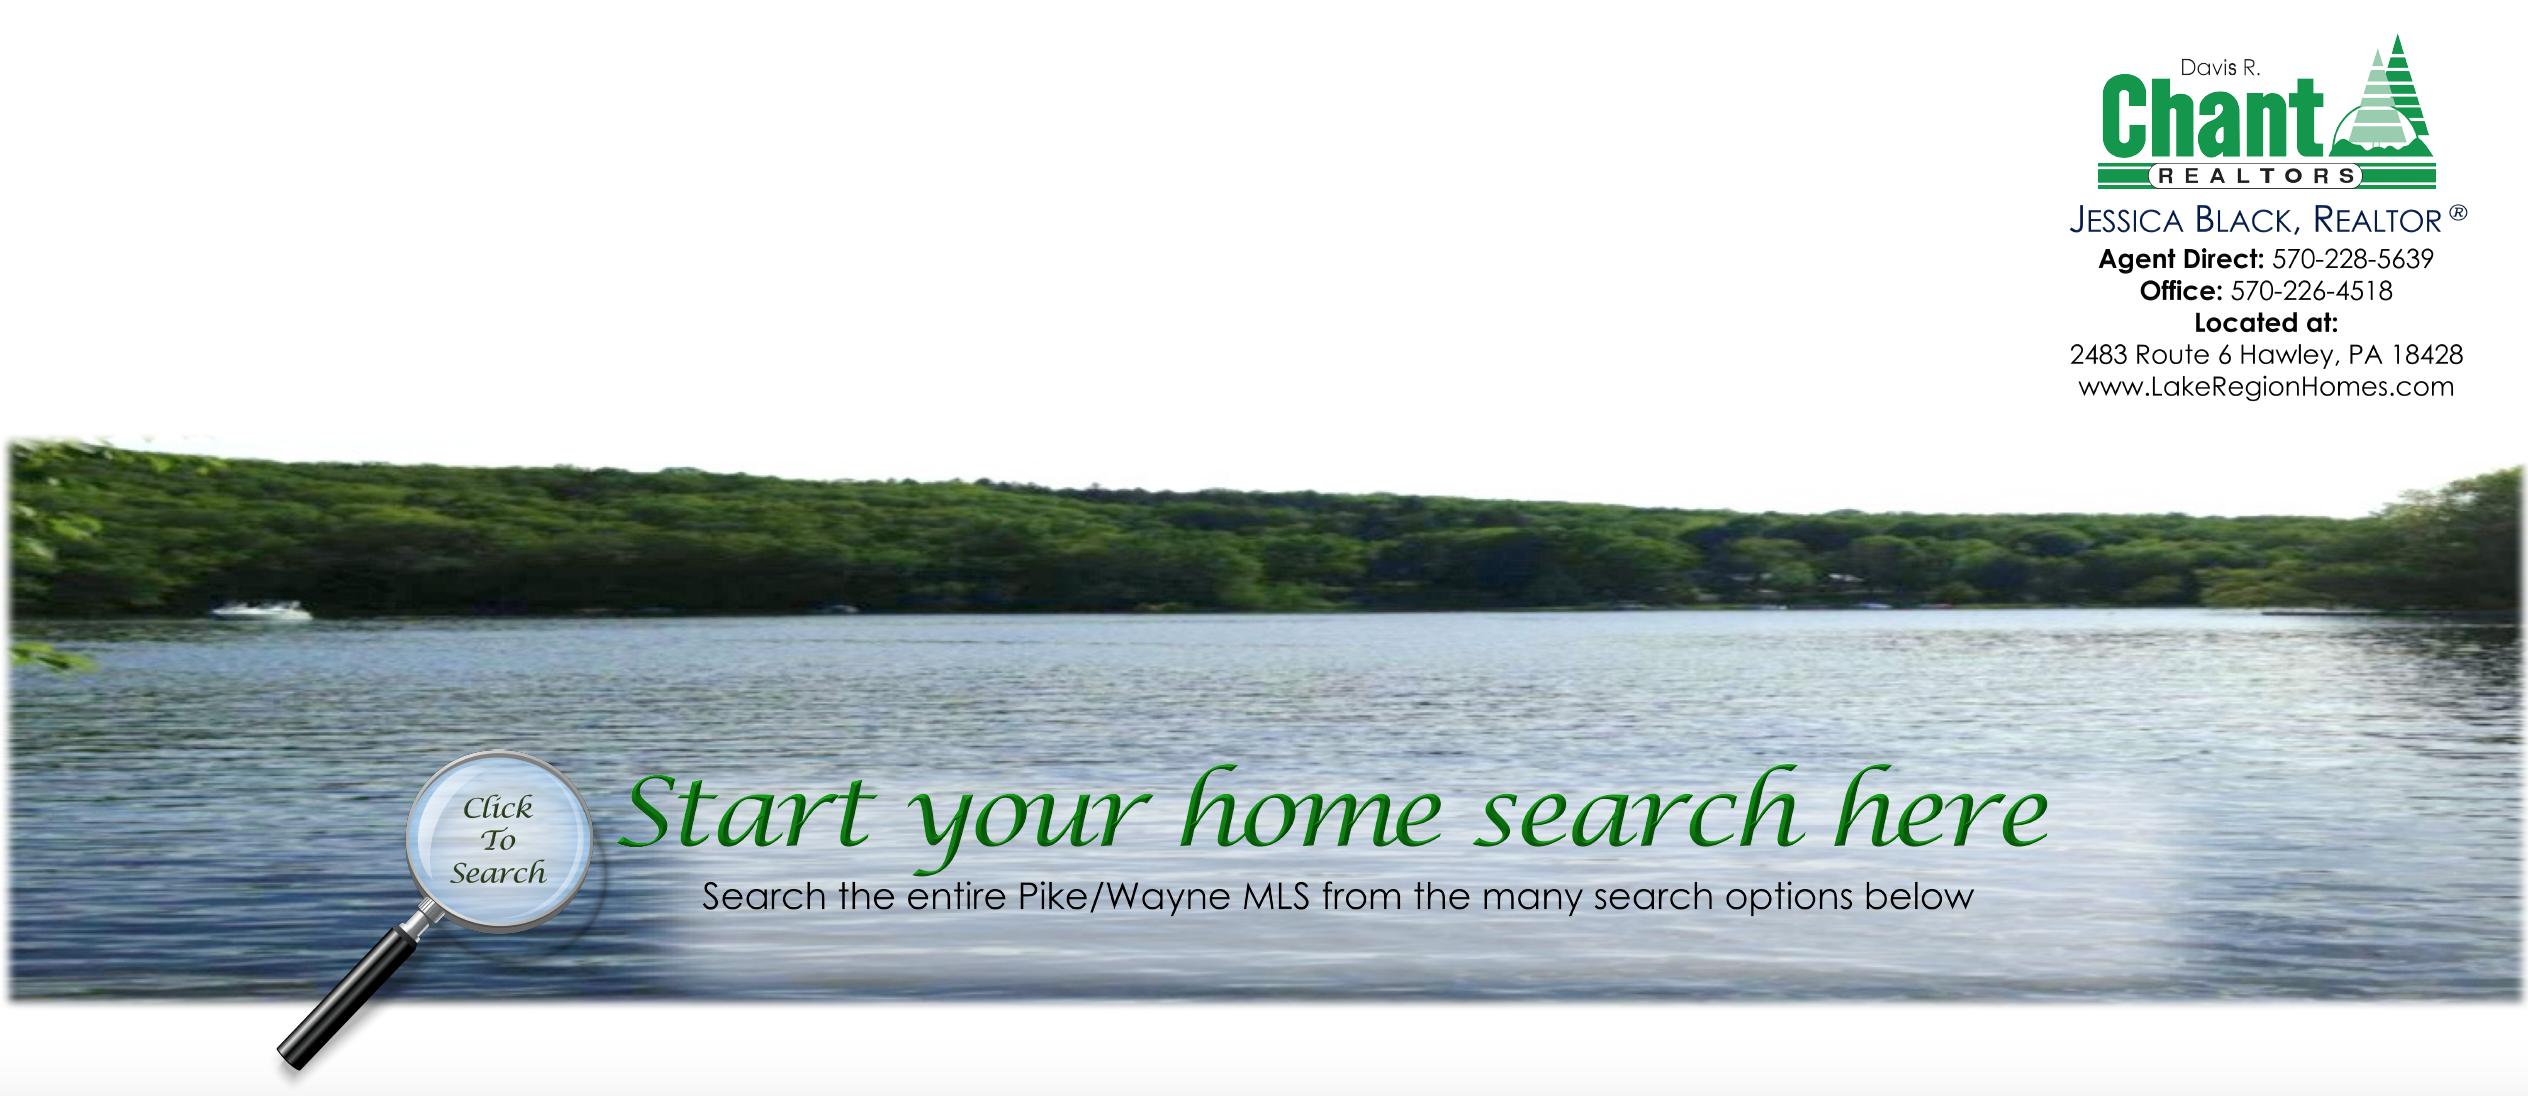 LakeRegionHomes.com